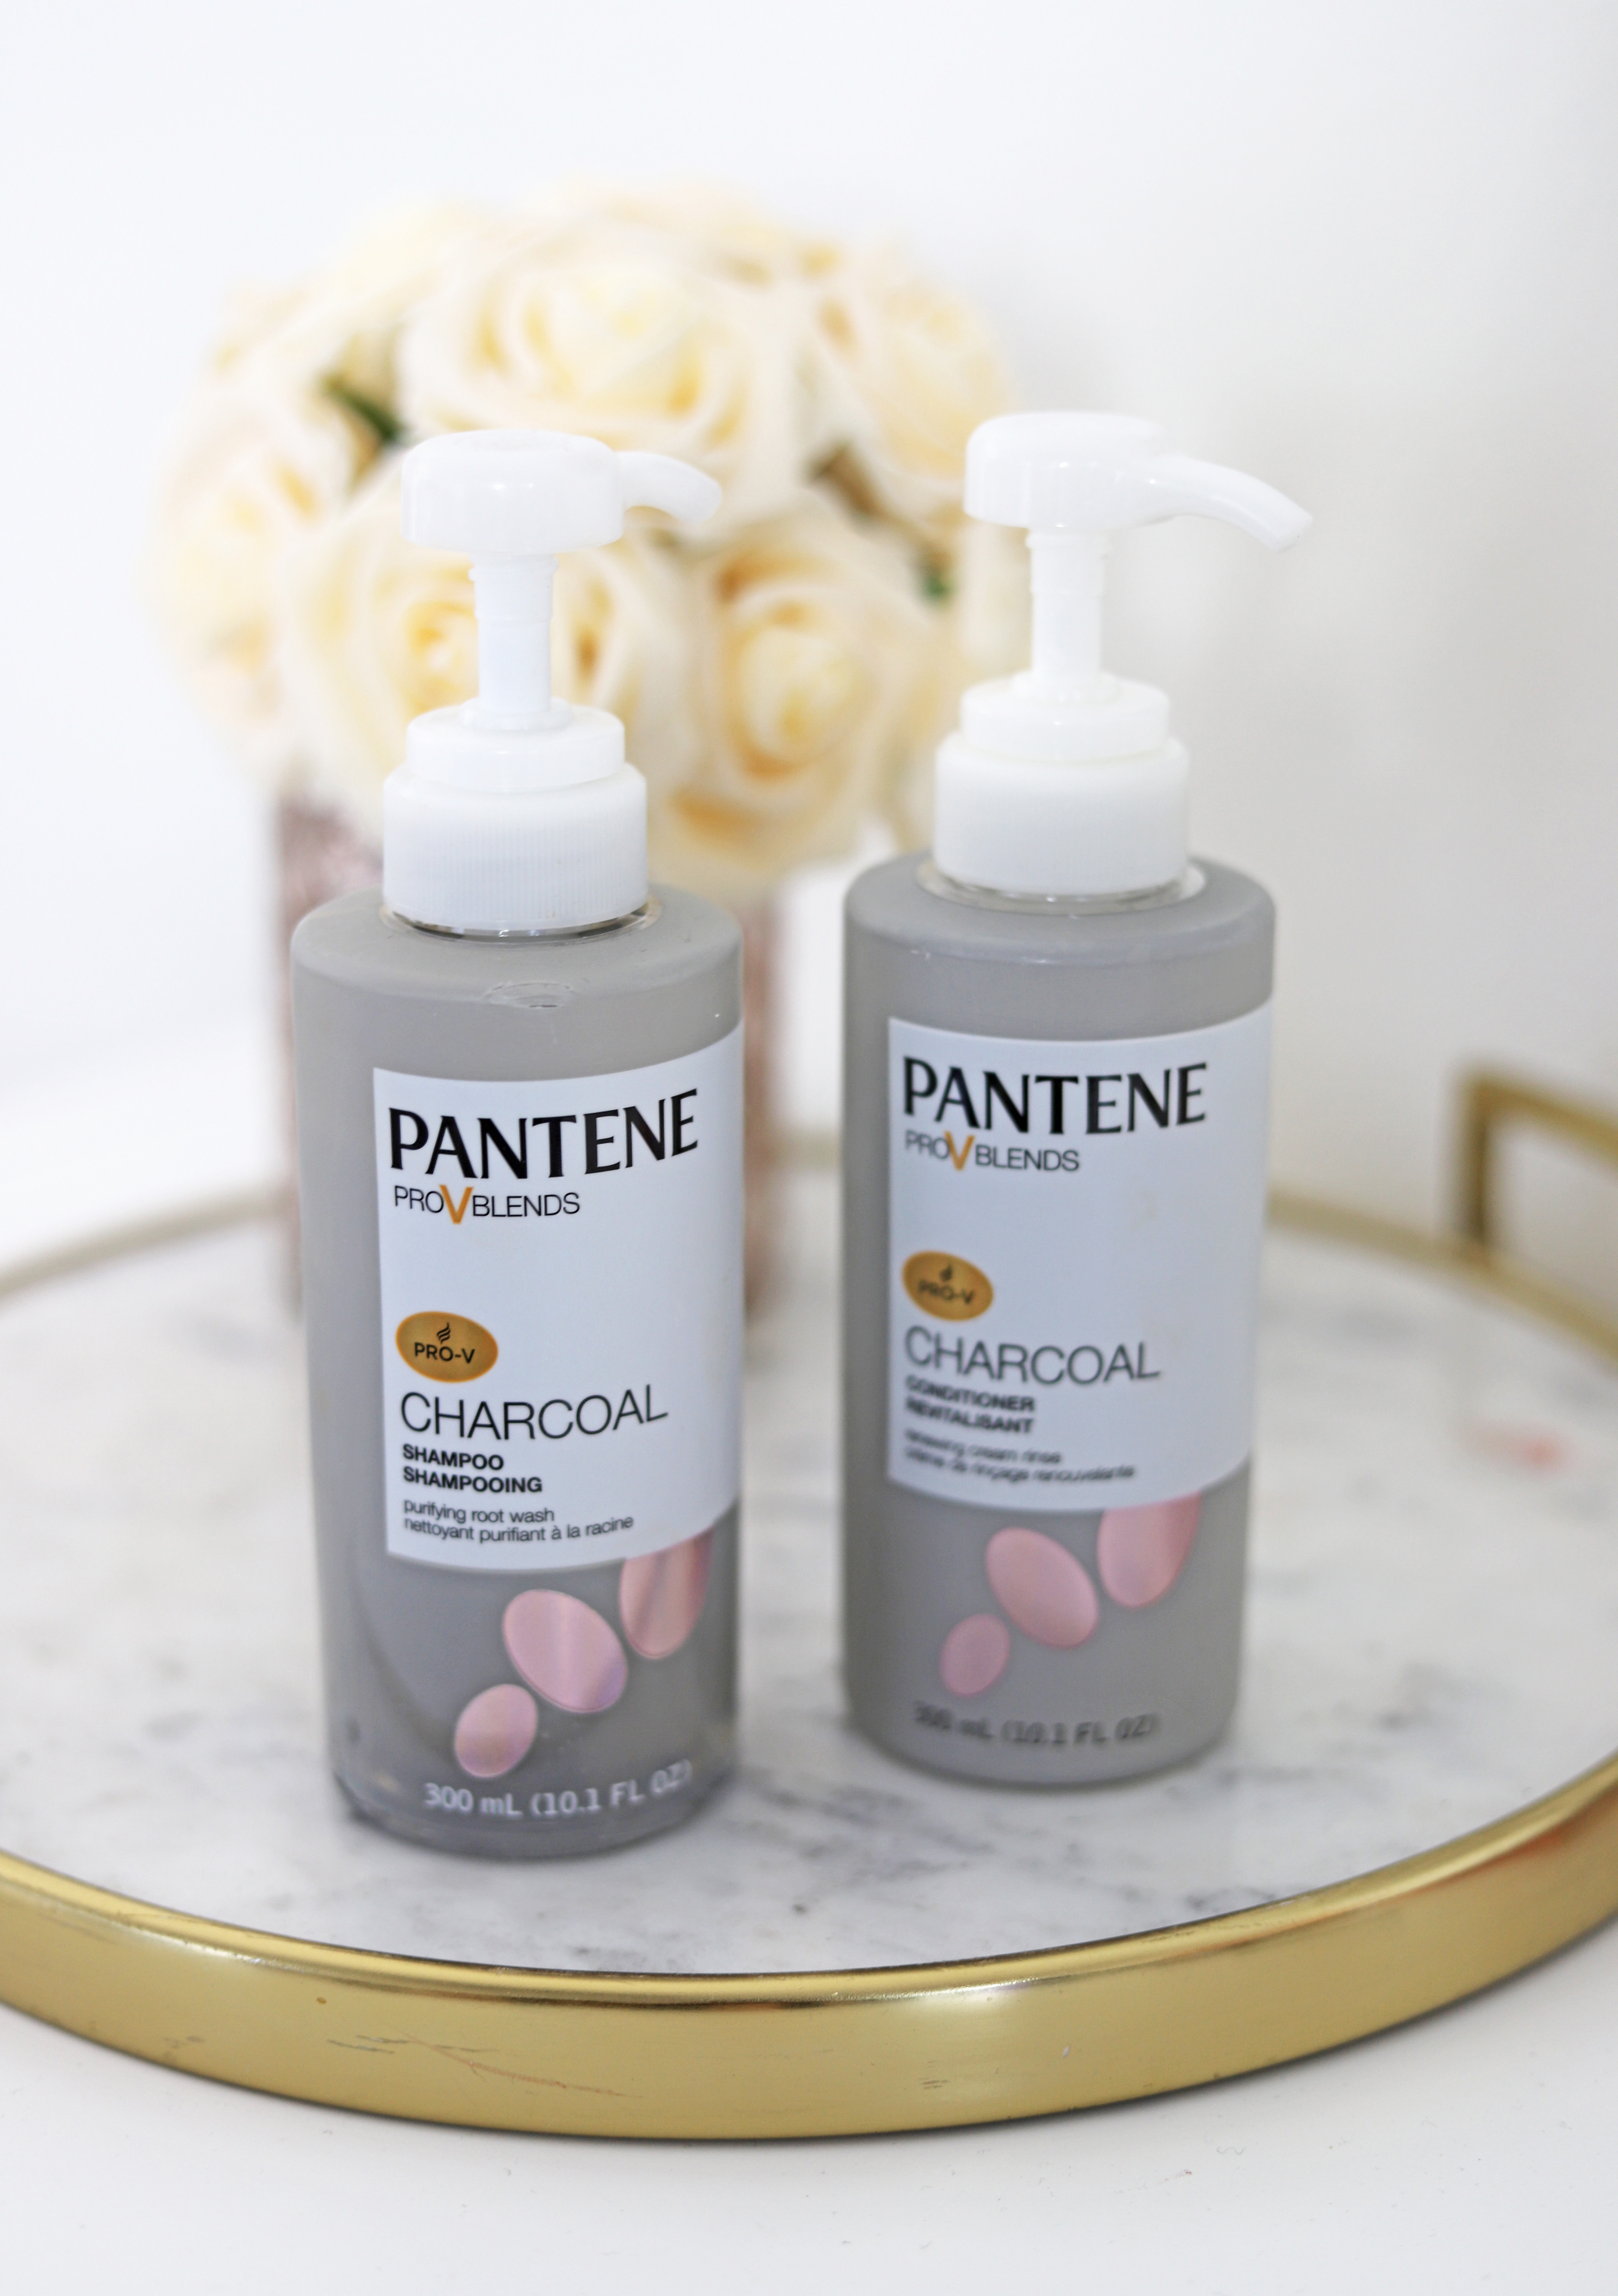 Mash elle beauty blogger | hairstyle | hair tutorial | Pantene | Charcoal pantene | Charcoal hair |